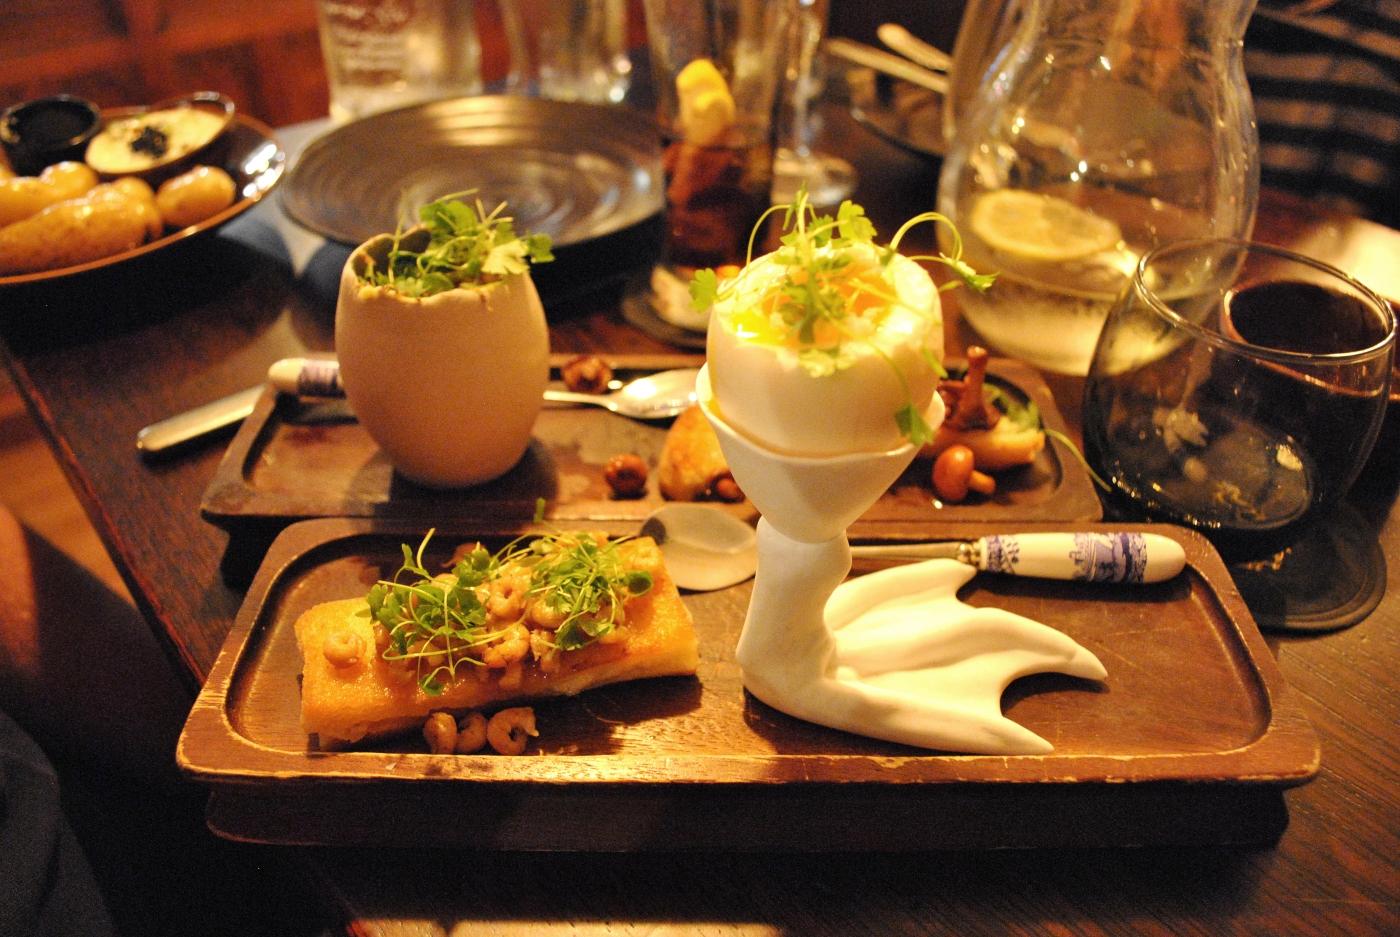 Soft Boiled Duck Egg, Toasted Crab Sandwich, Melting Potted Shrimps